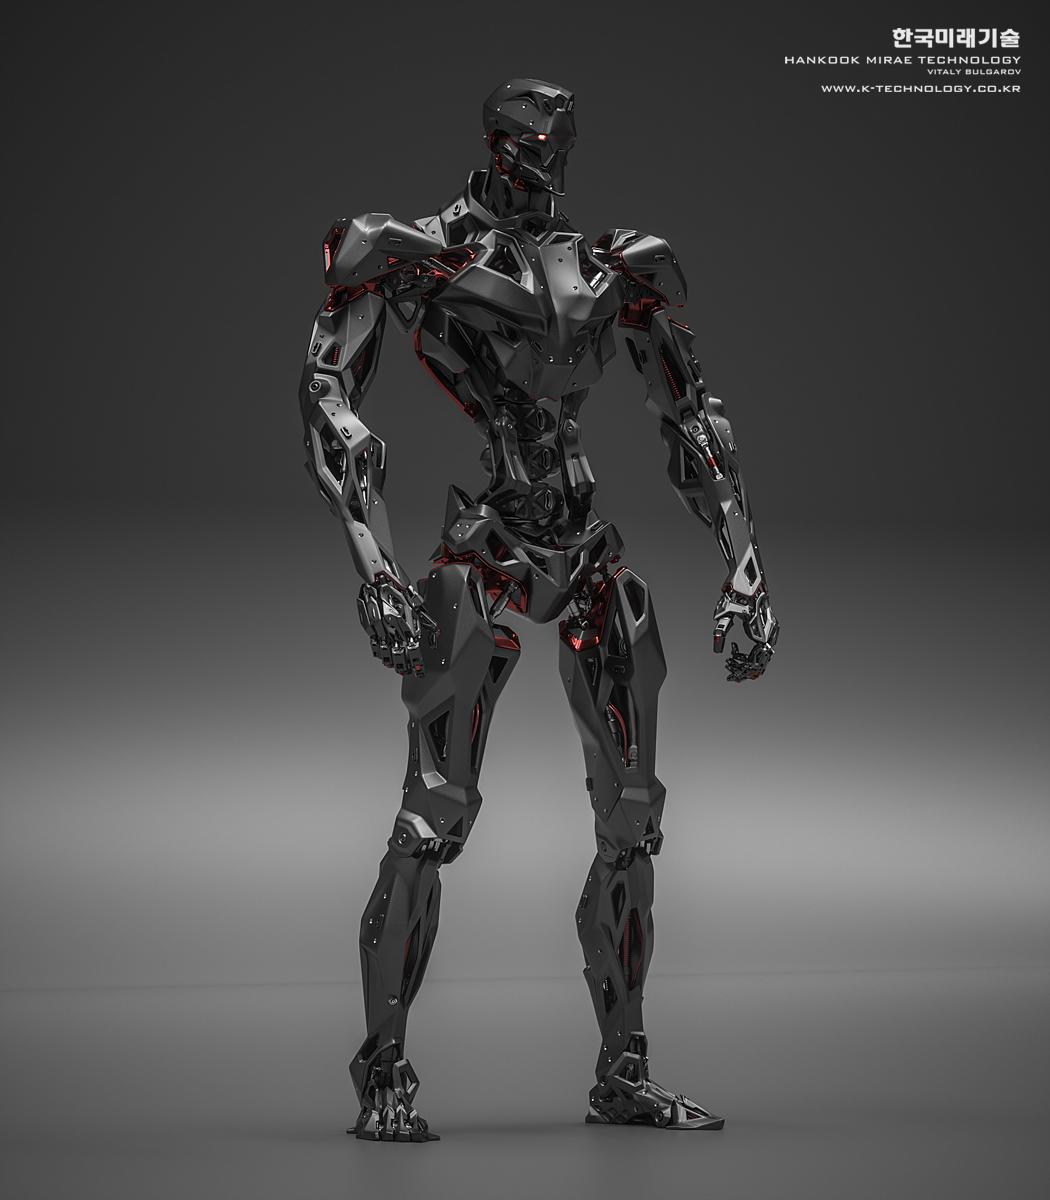 KFT_2.Xm_RobotDesign_ (24 of 29).jpg